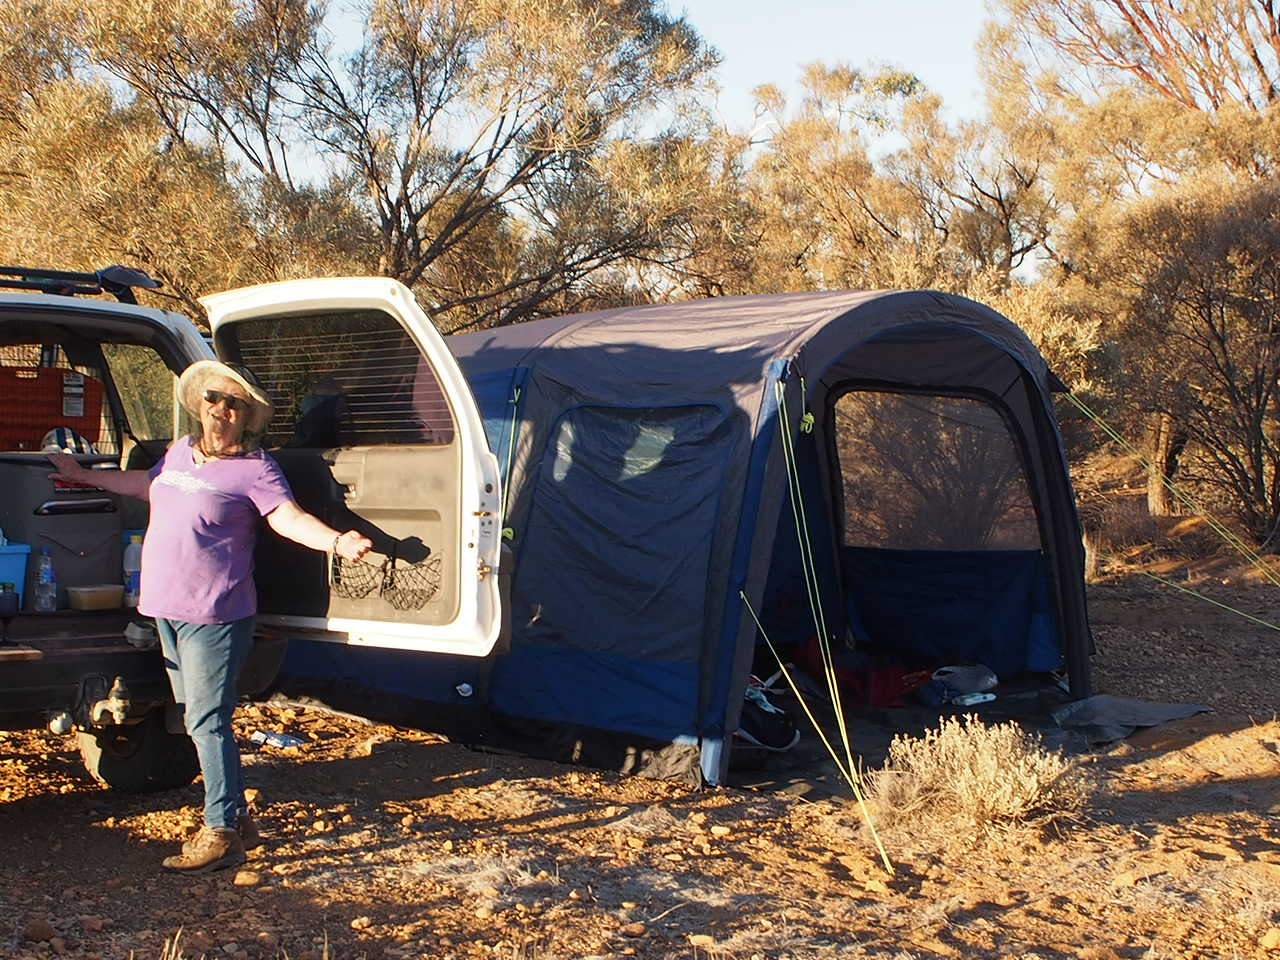 2019-07-5b Robyn with exTerrain tent 3'O'Clock Creek.JPG